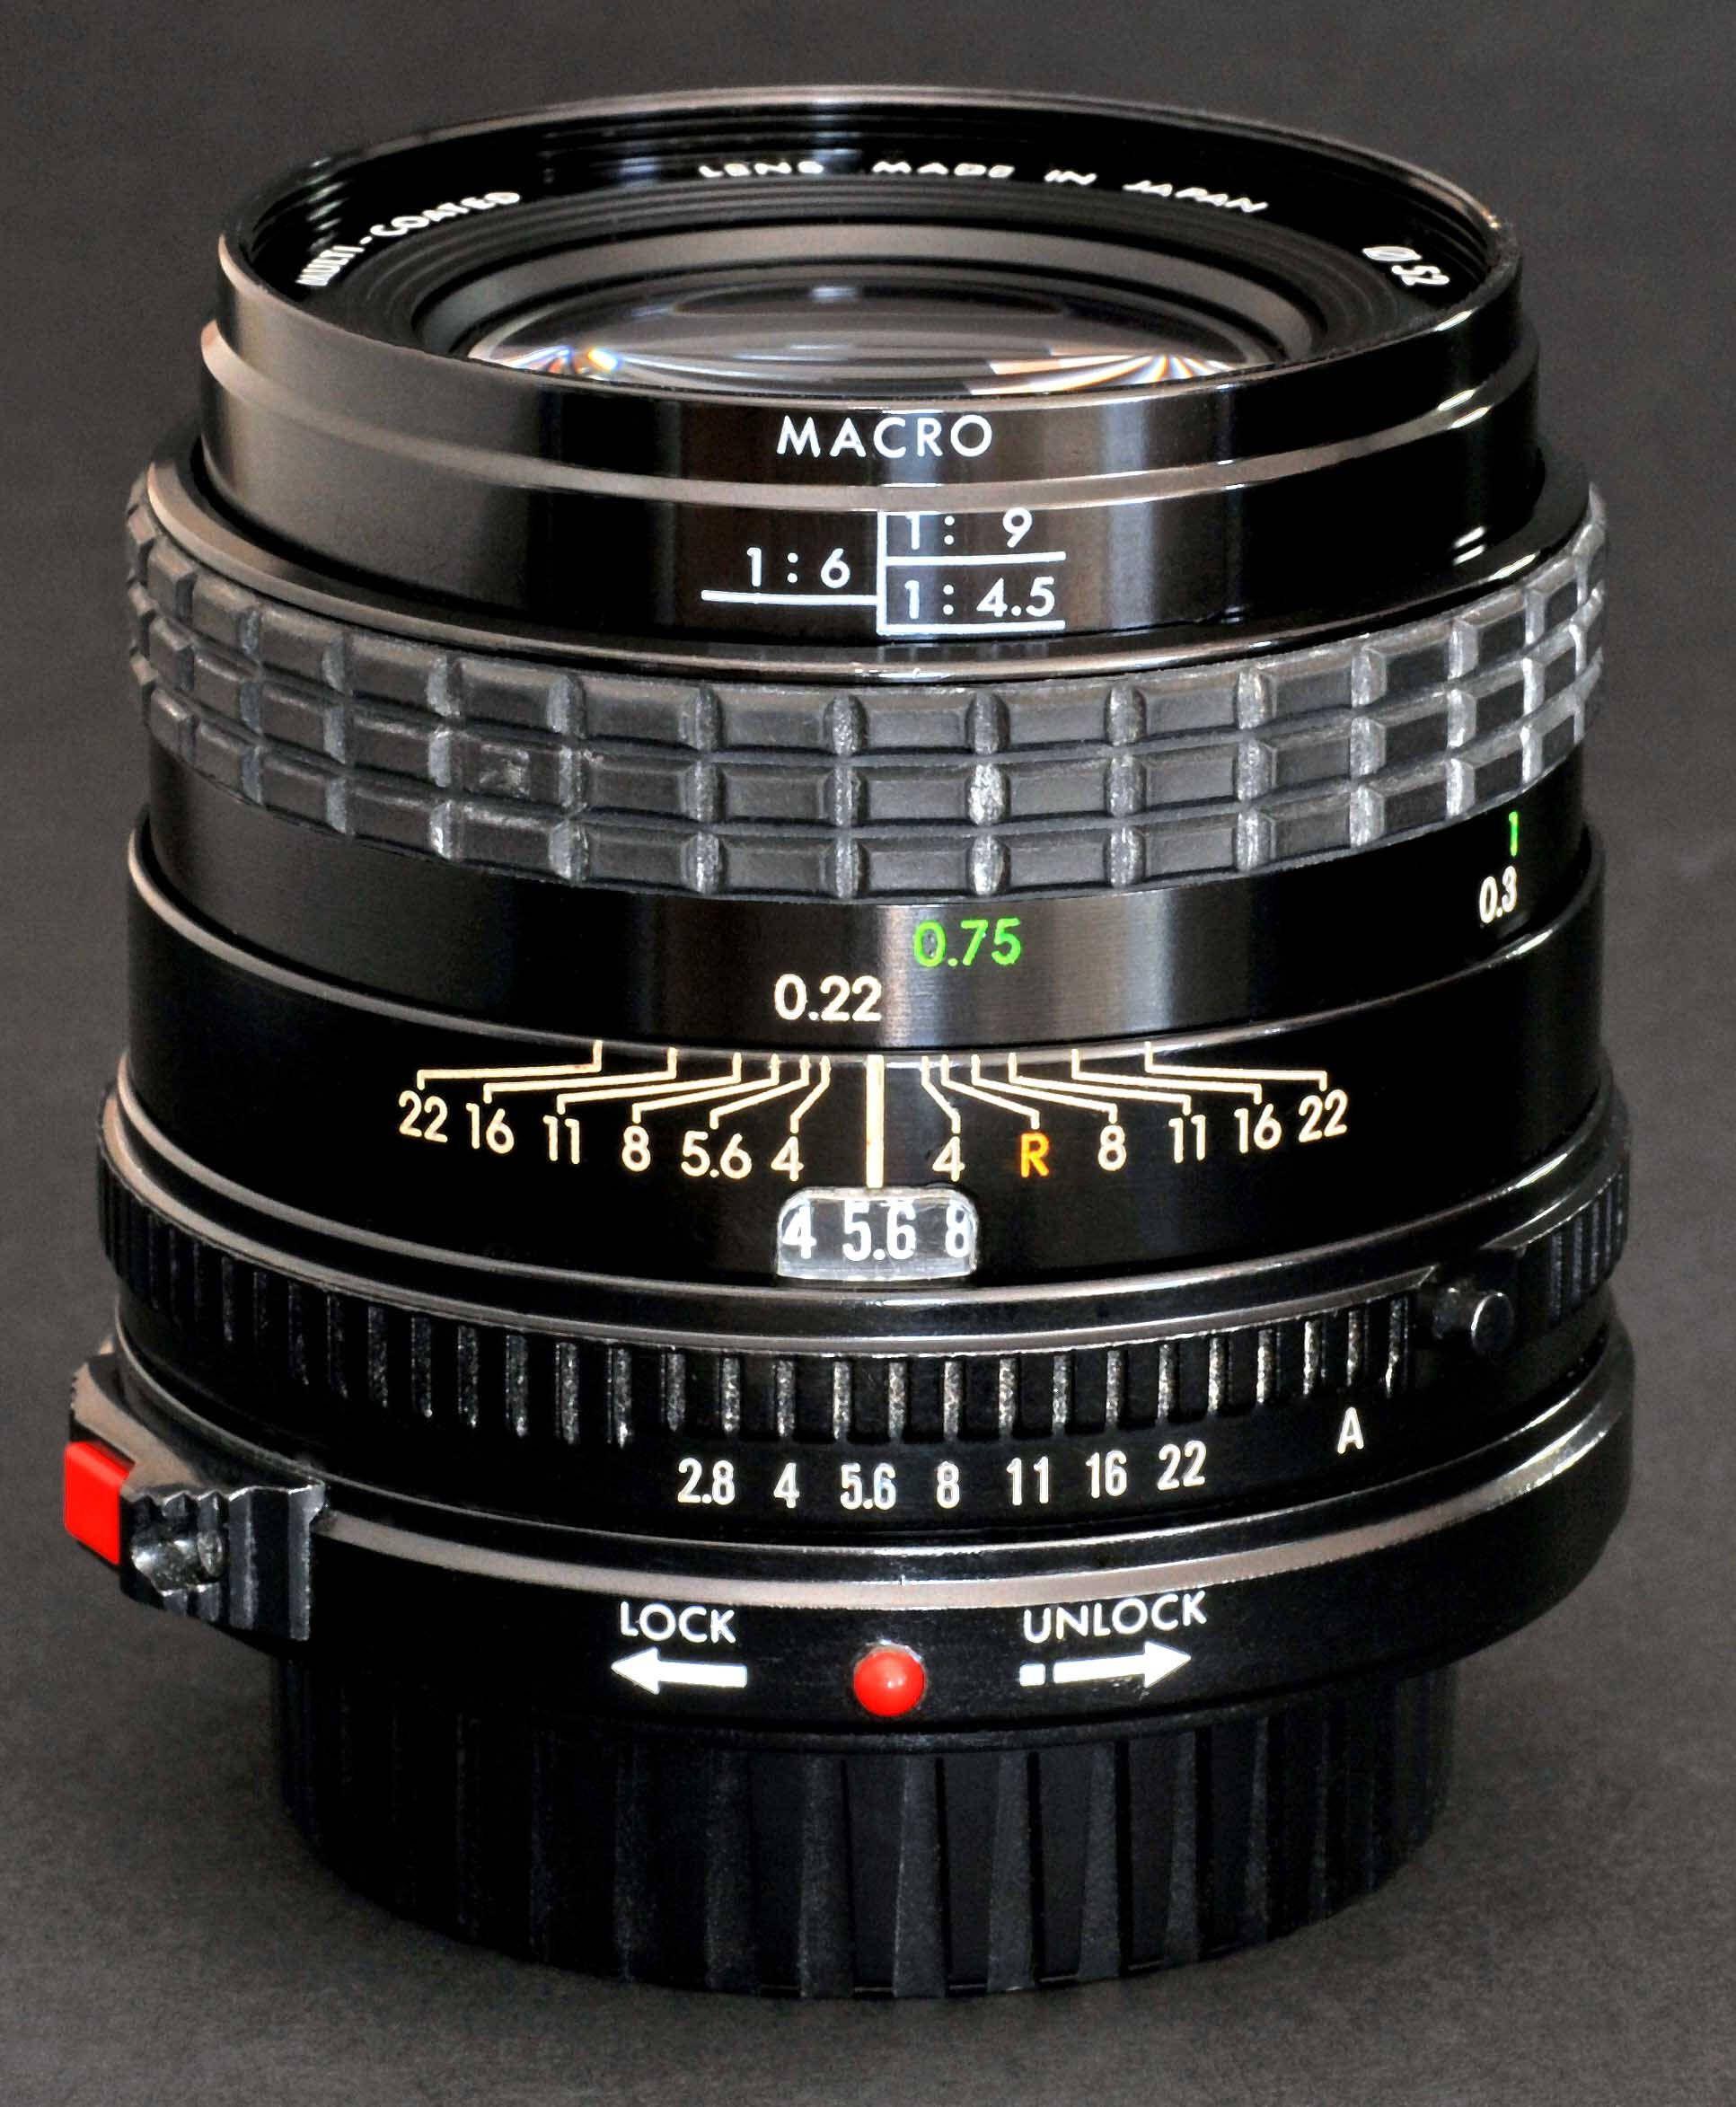 Canon Fd 28mm F 2 8 Mc Macro 1 4 5 Wide Angle Prime Lens Sigma Etsy Wide Angle Prime Lens Mirrorless Camera